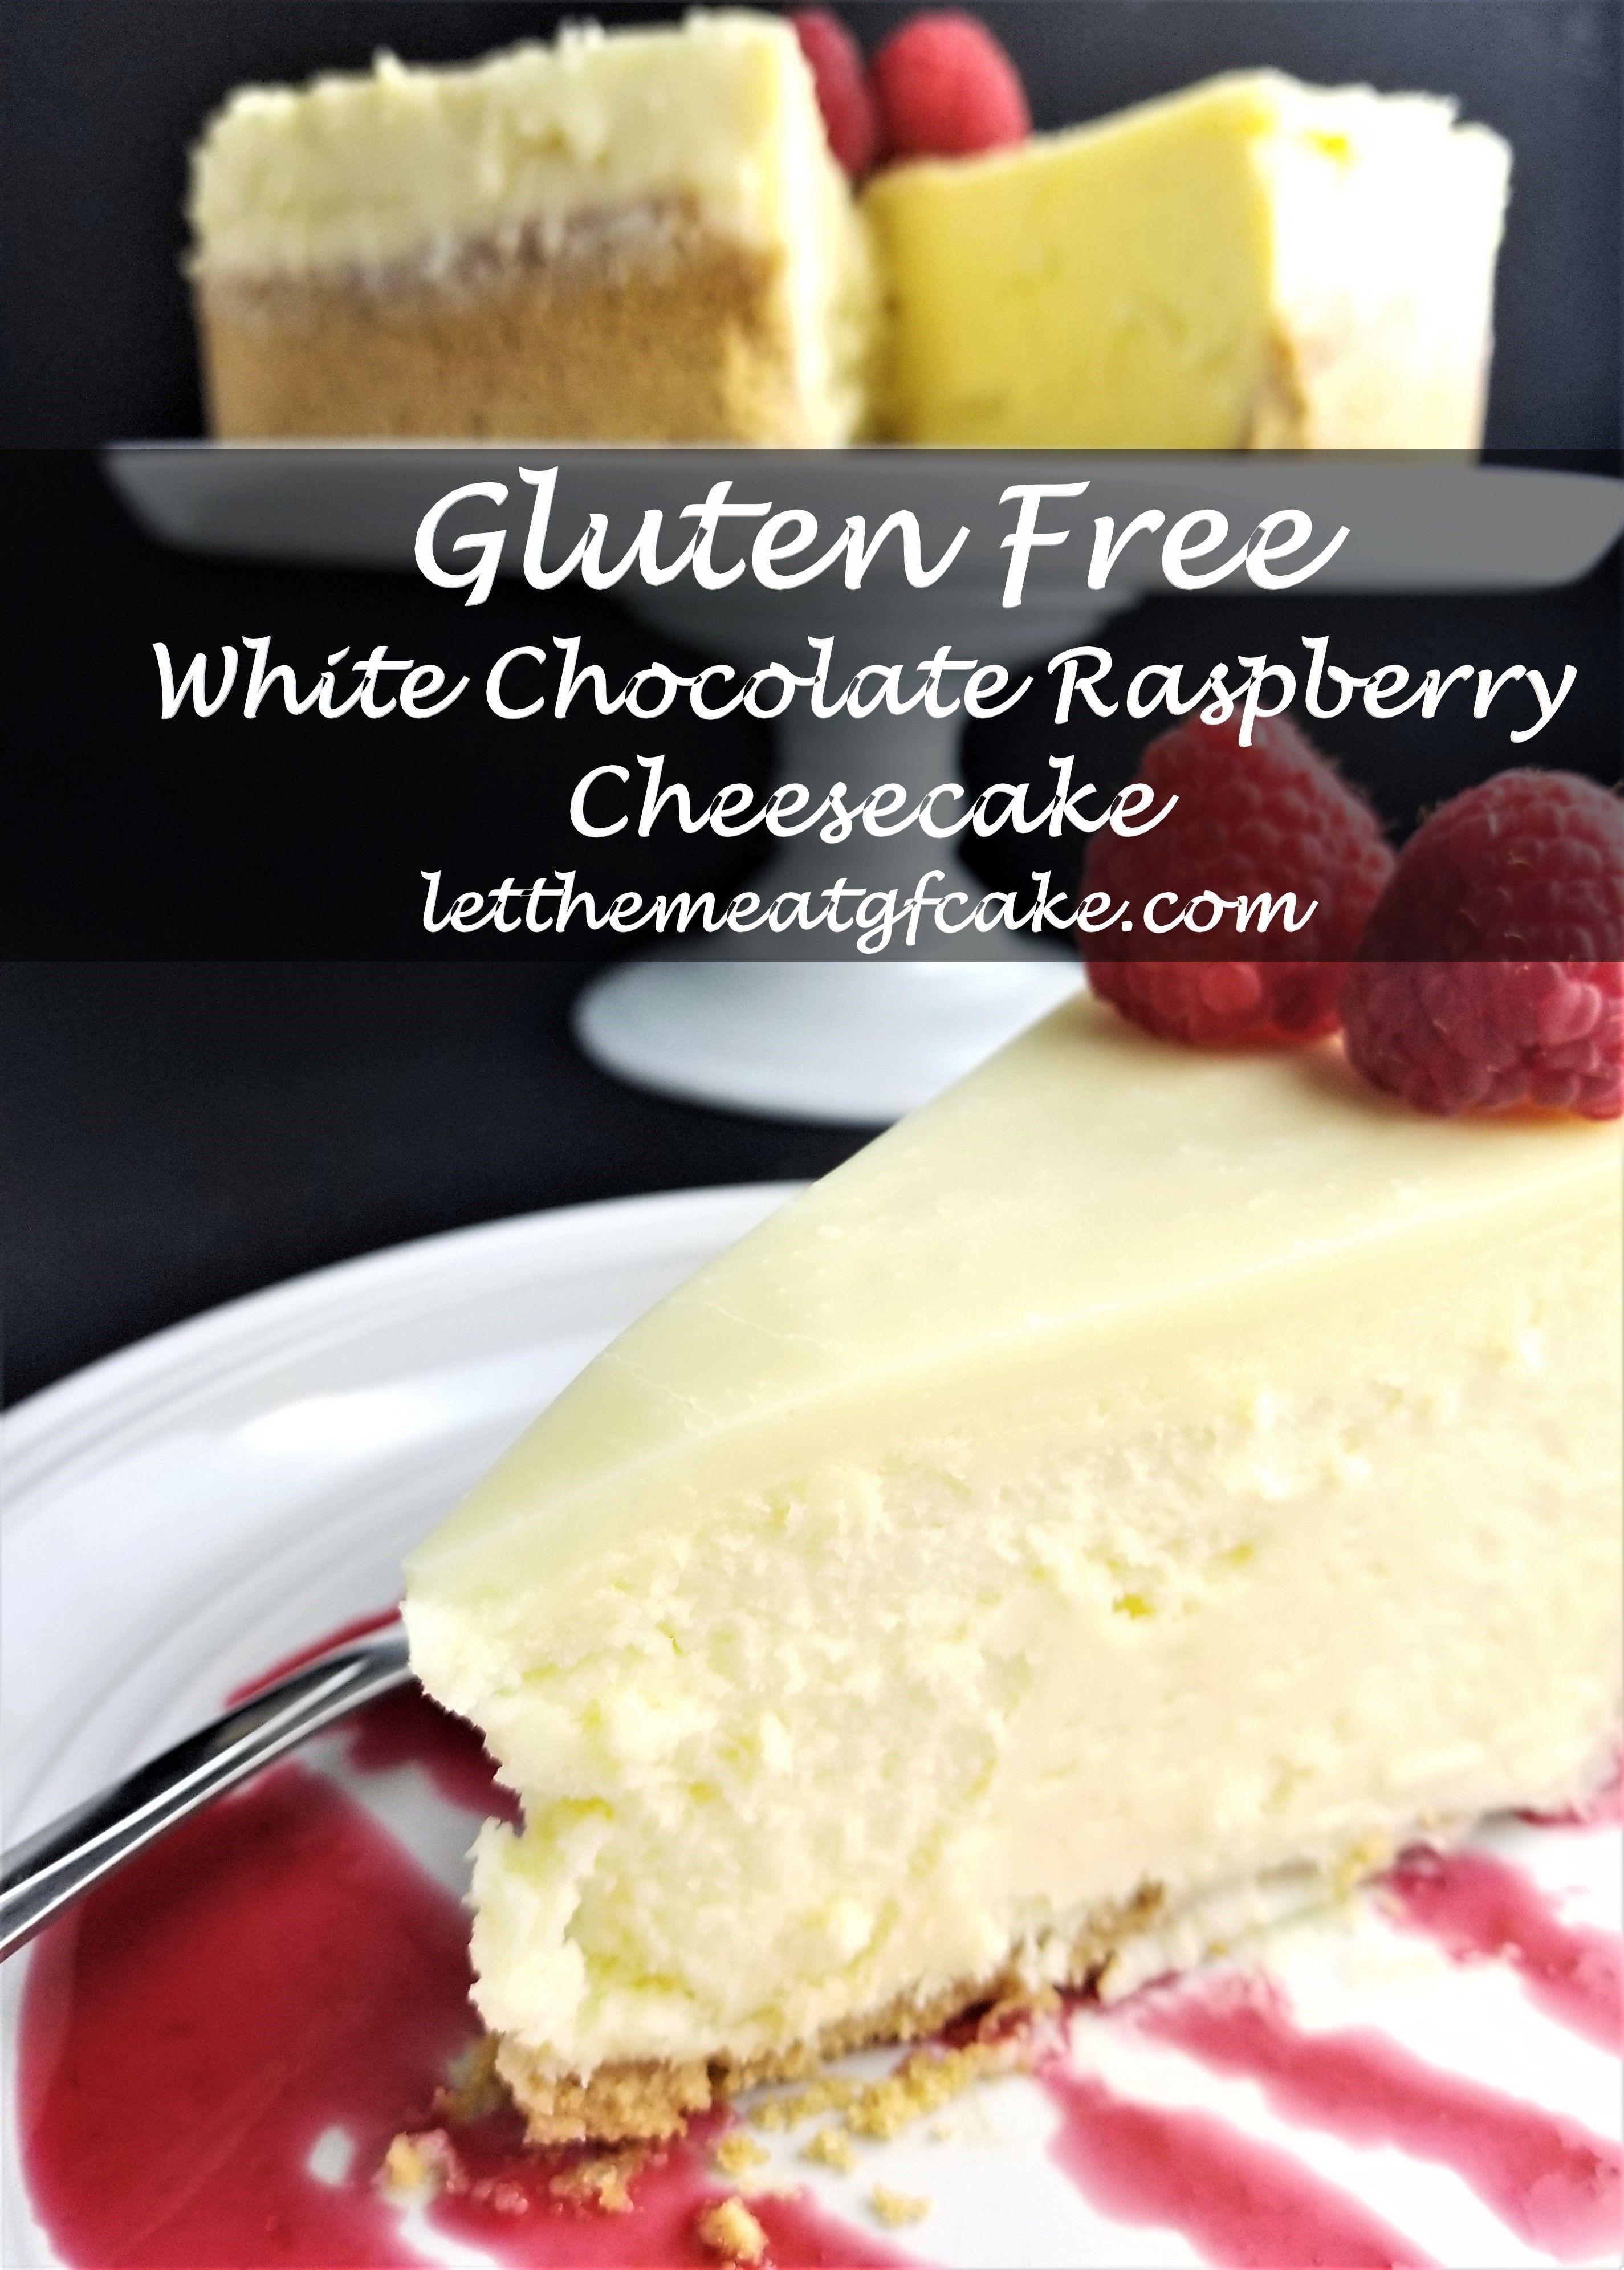 Gluten Free White Chocolate Raspberry Cheesecake Let Them Eat Gluten Free Cake Recipe Chocolate Raspberry Cheesecake White Chocolate Raspberry Cheesecake Raspberry Cheesecake